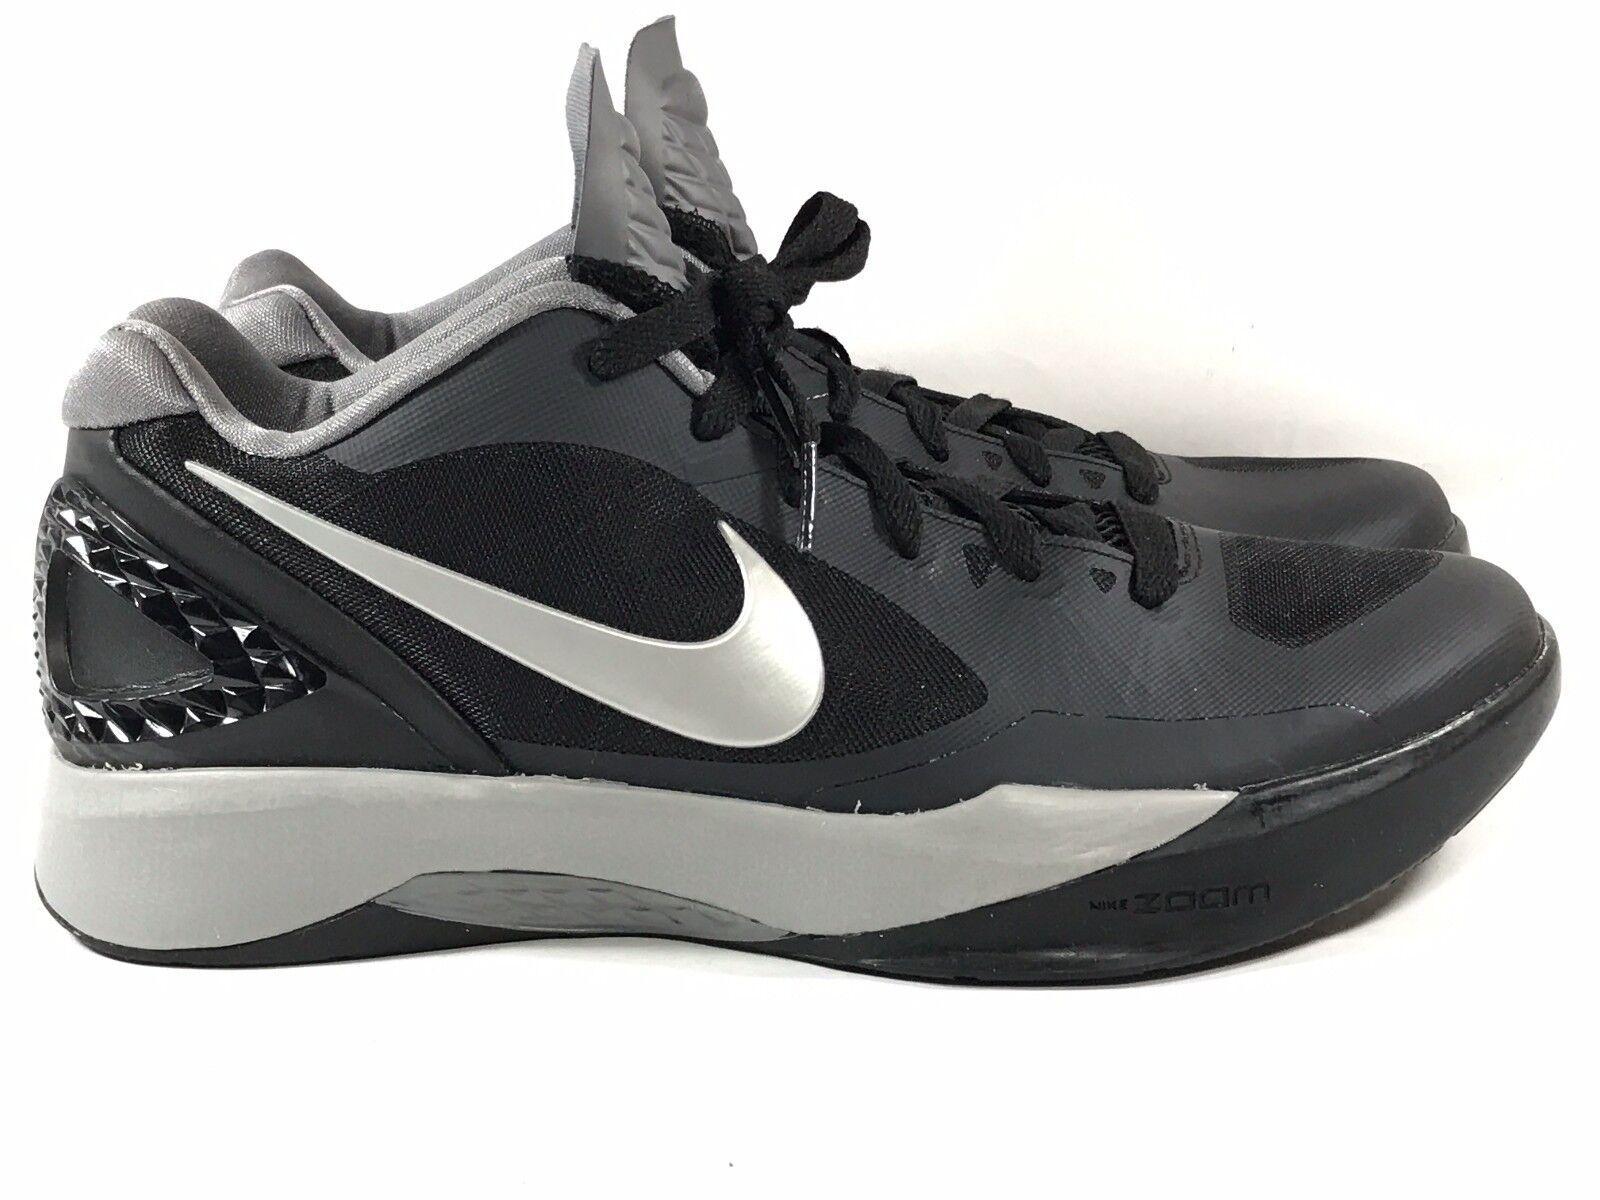 Nike Women's Volley Zoom Hyperspike sz 13 Black Metallic Silver shos 585763-001